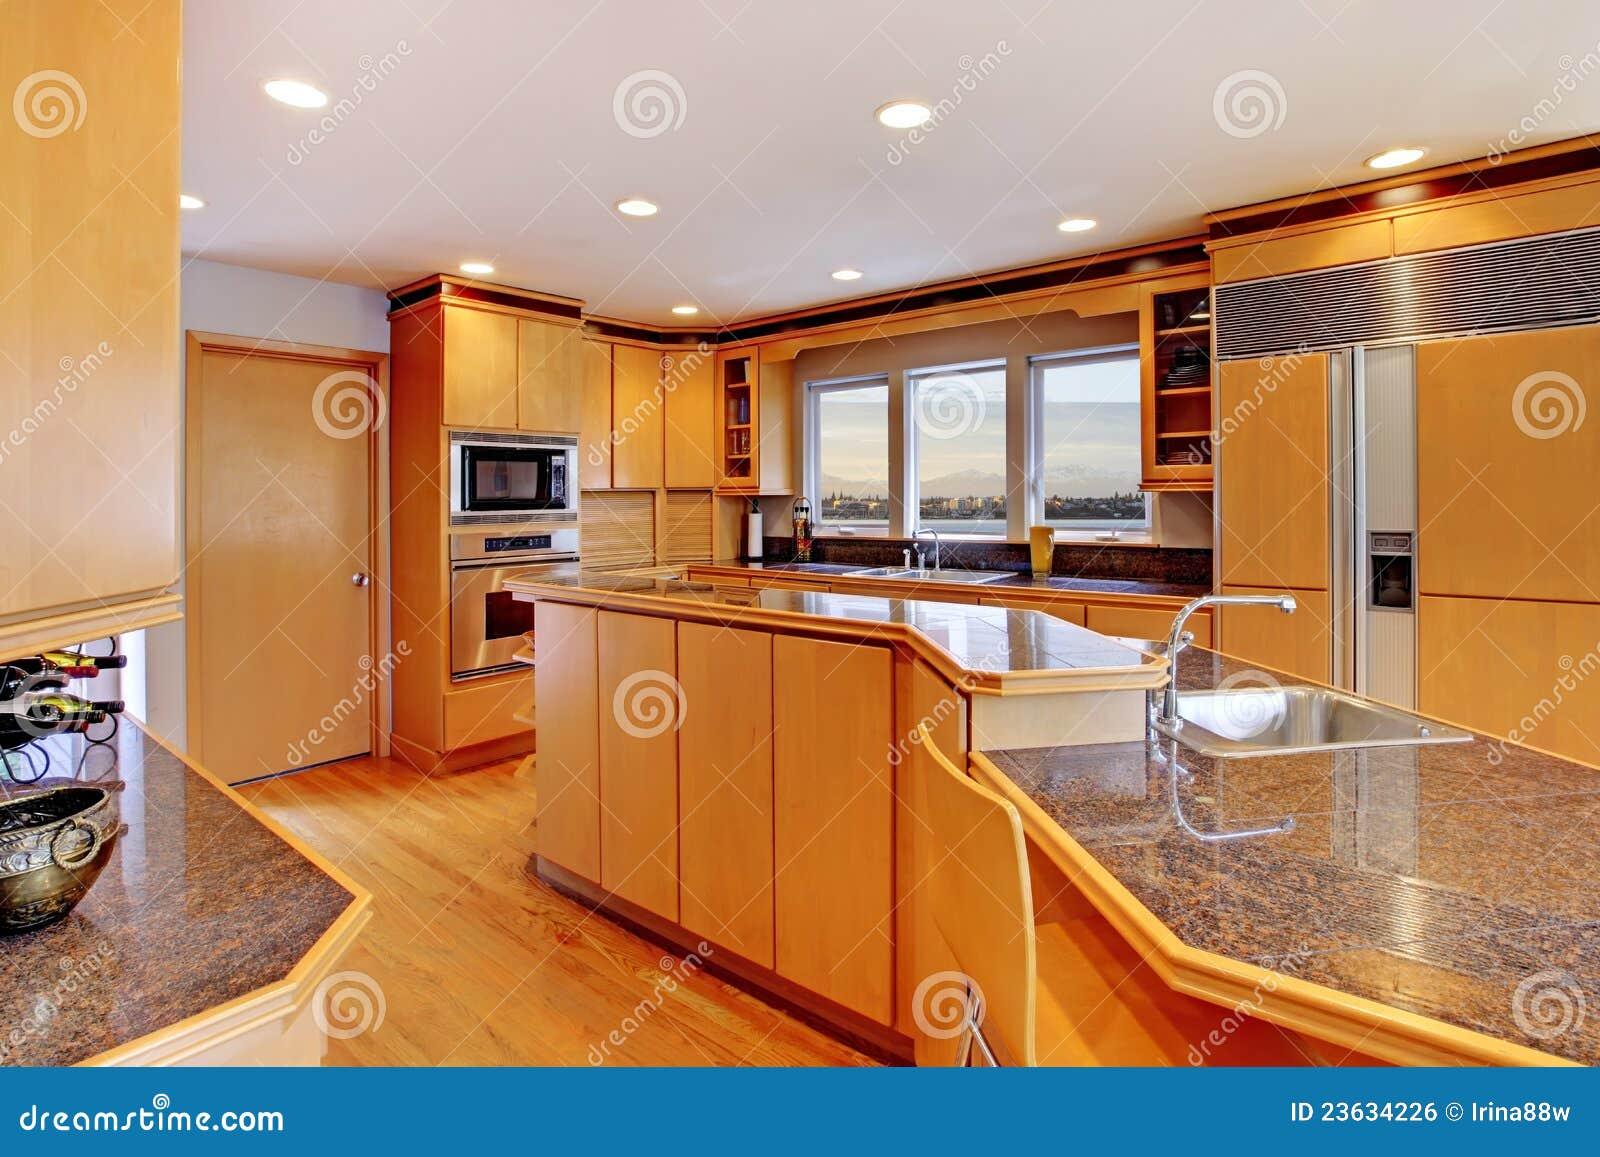 grande cuisine en bois moderne de luxe image libre de. Black Bedroom Furniture Sets. Home Design Ideas